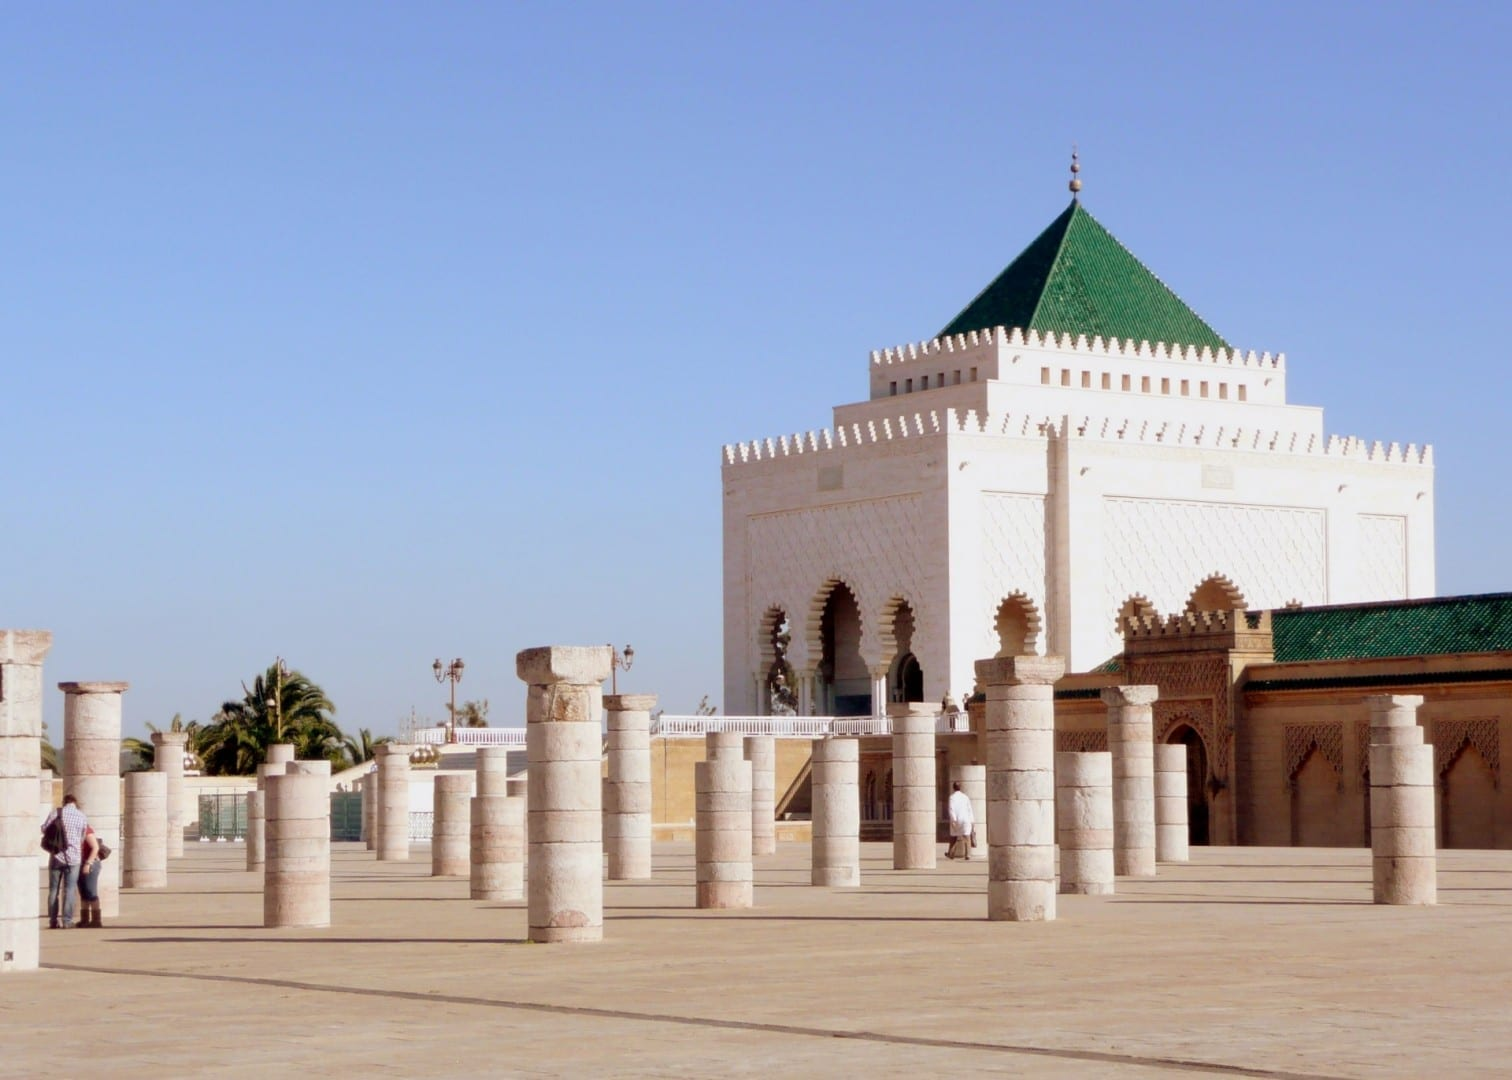 Mausoleo de Mohammed 5 Rabat Marruecos